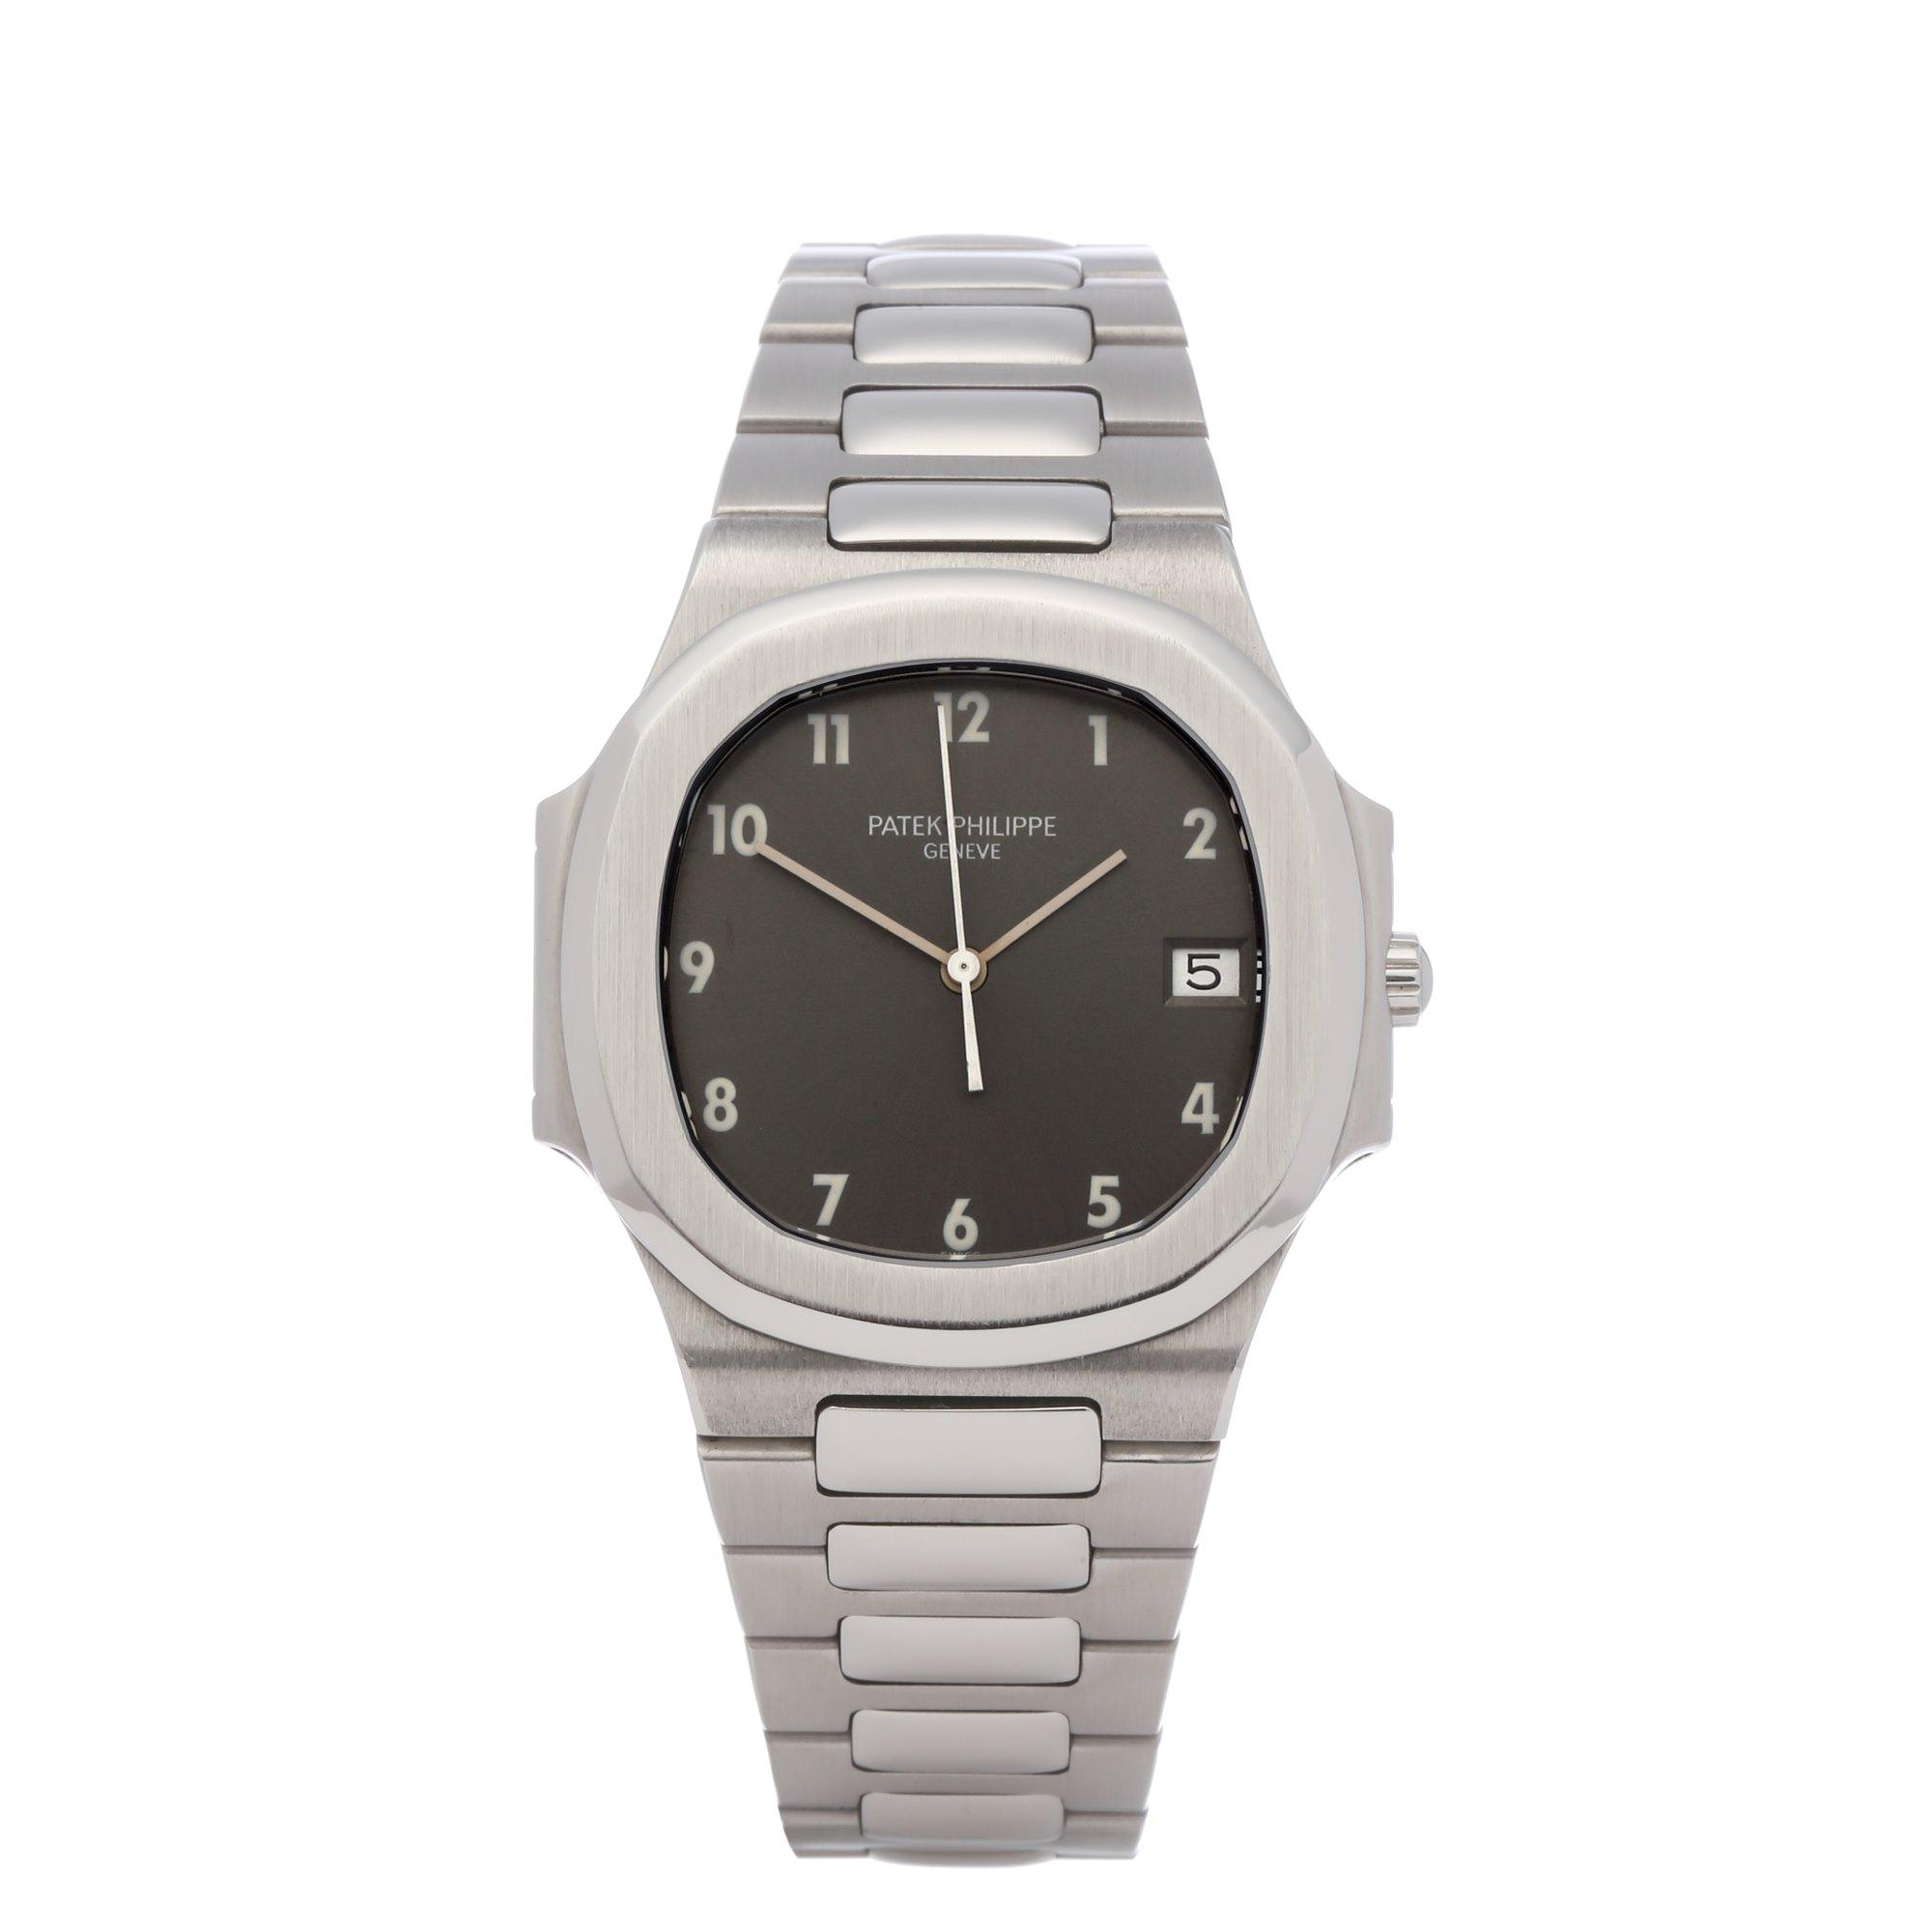 Patek Philippe Nautilus Rare Grey Dial Stainless Steel 3900